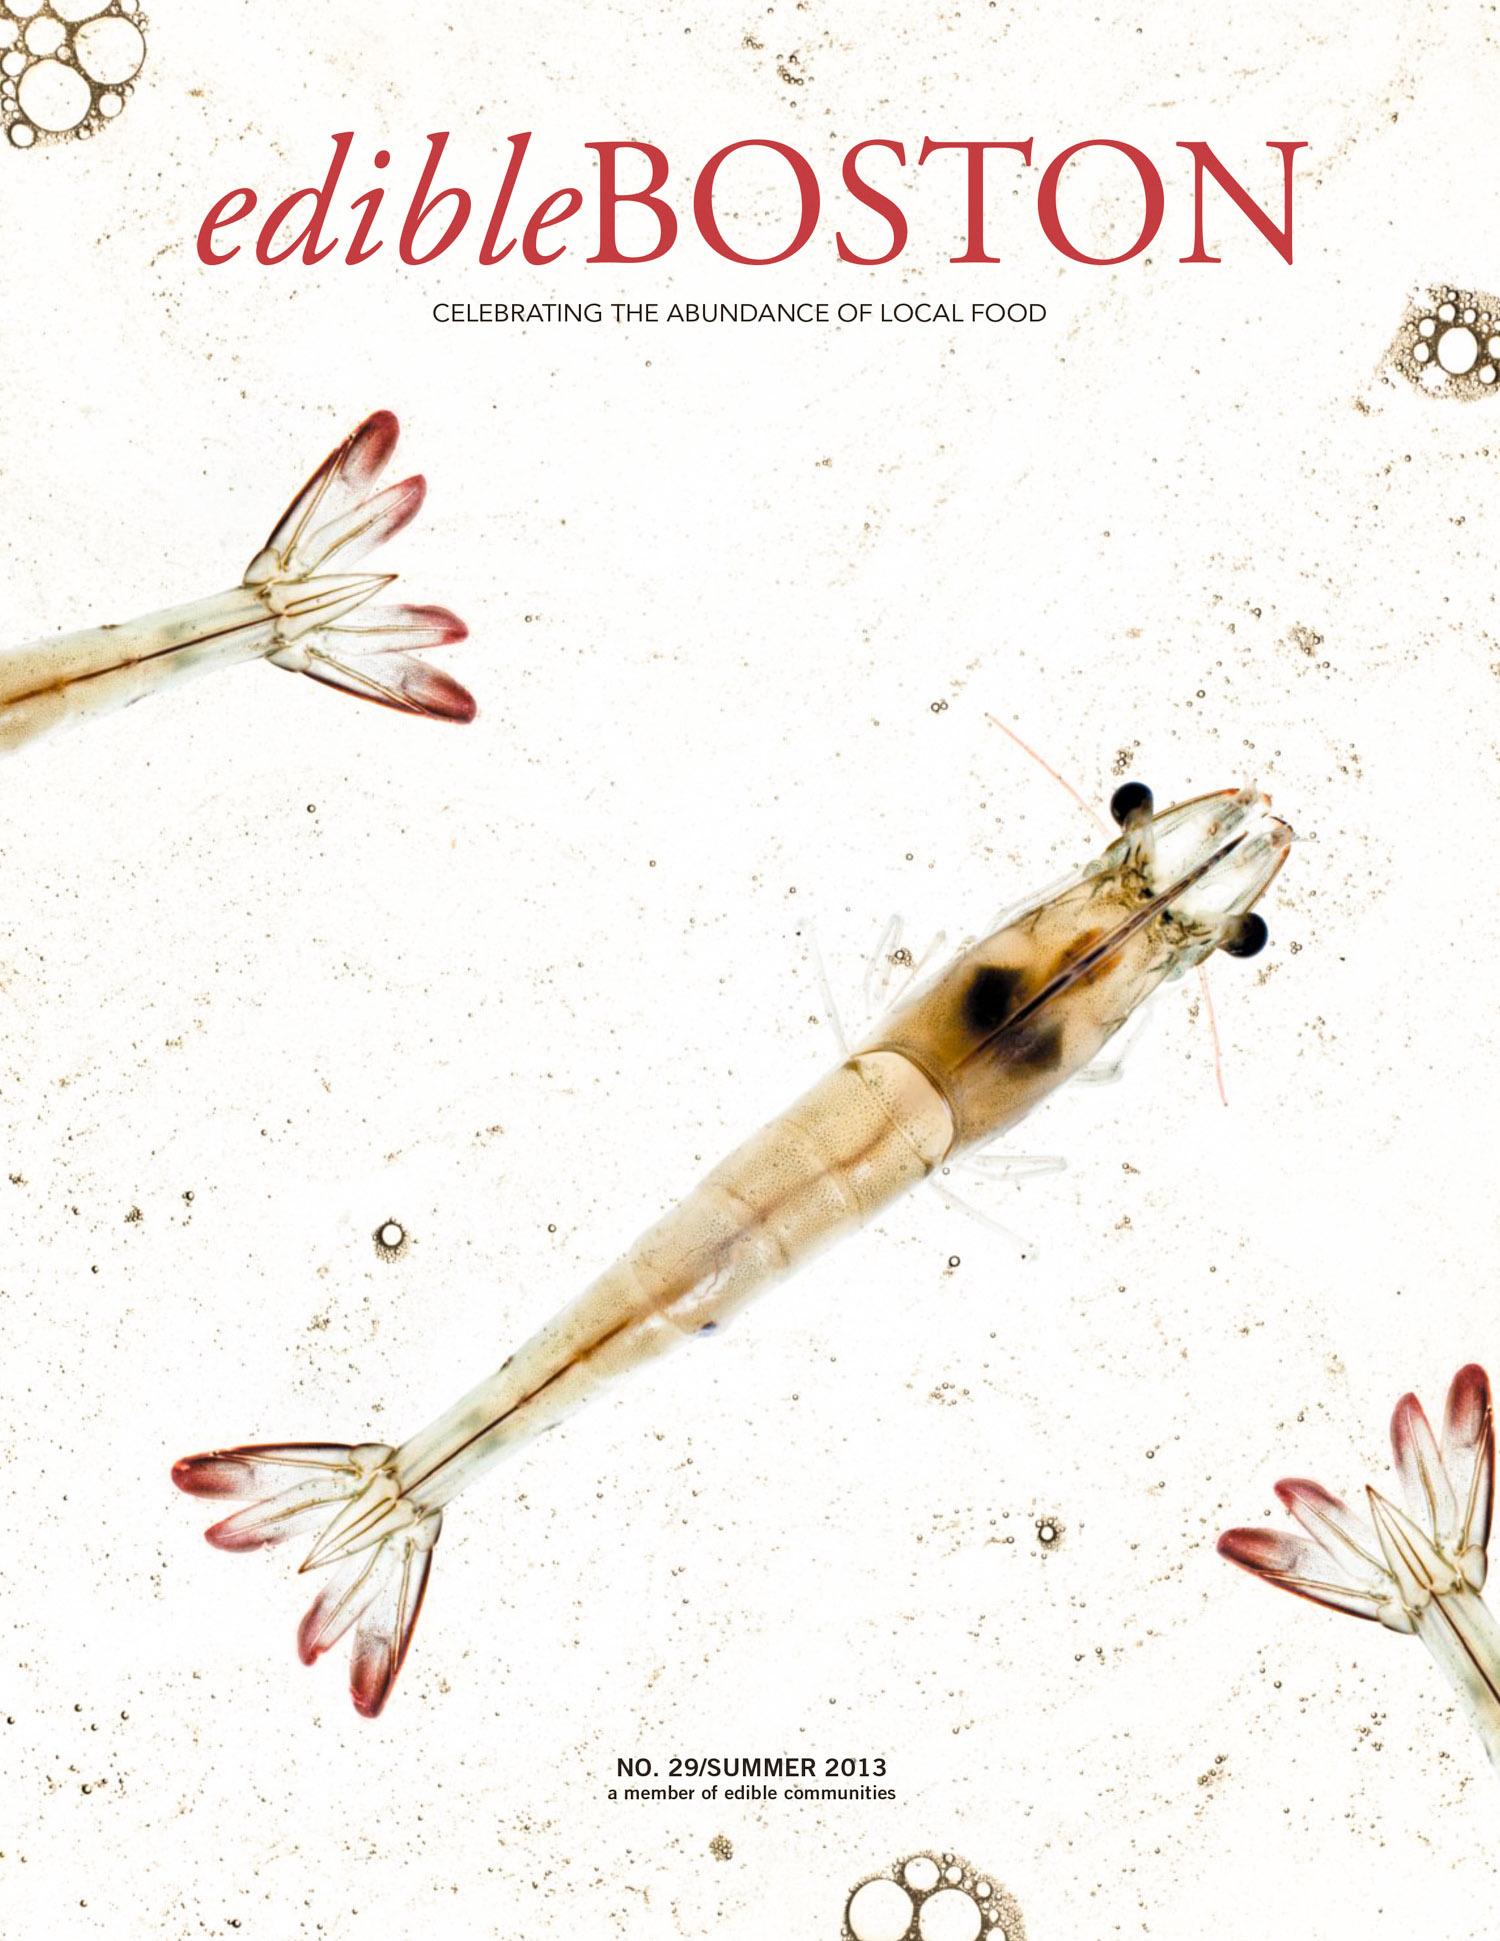 Sky8 Shrimp Edible Boston Cover photographed by Adam DeTour